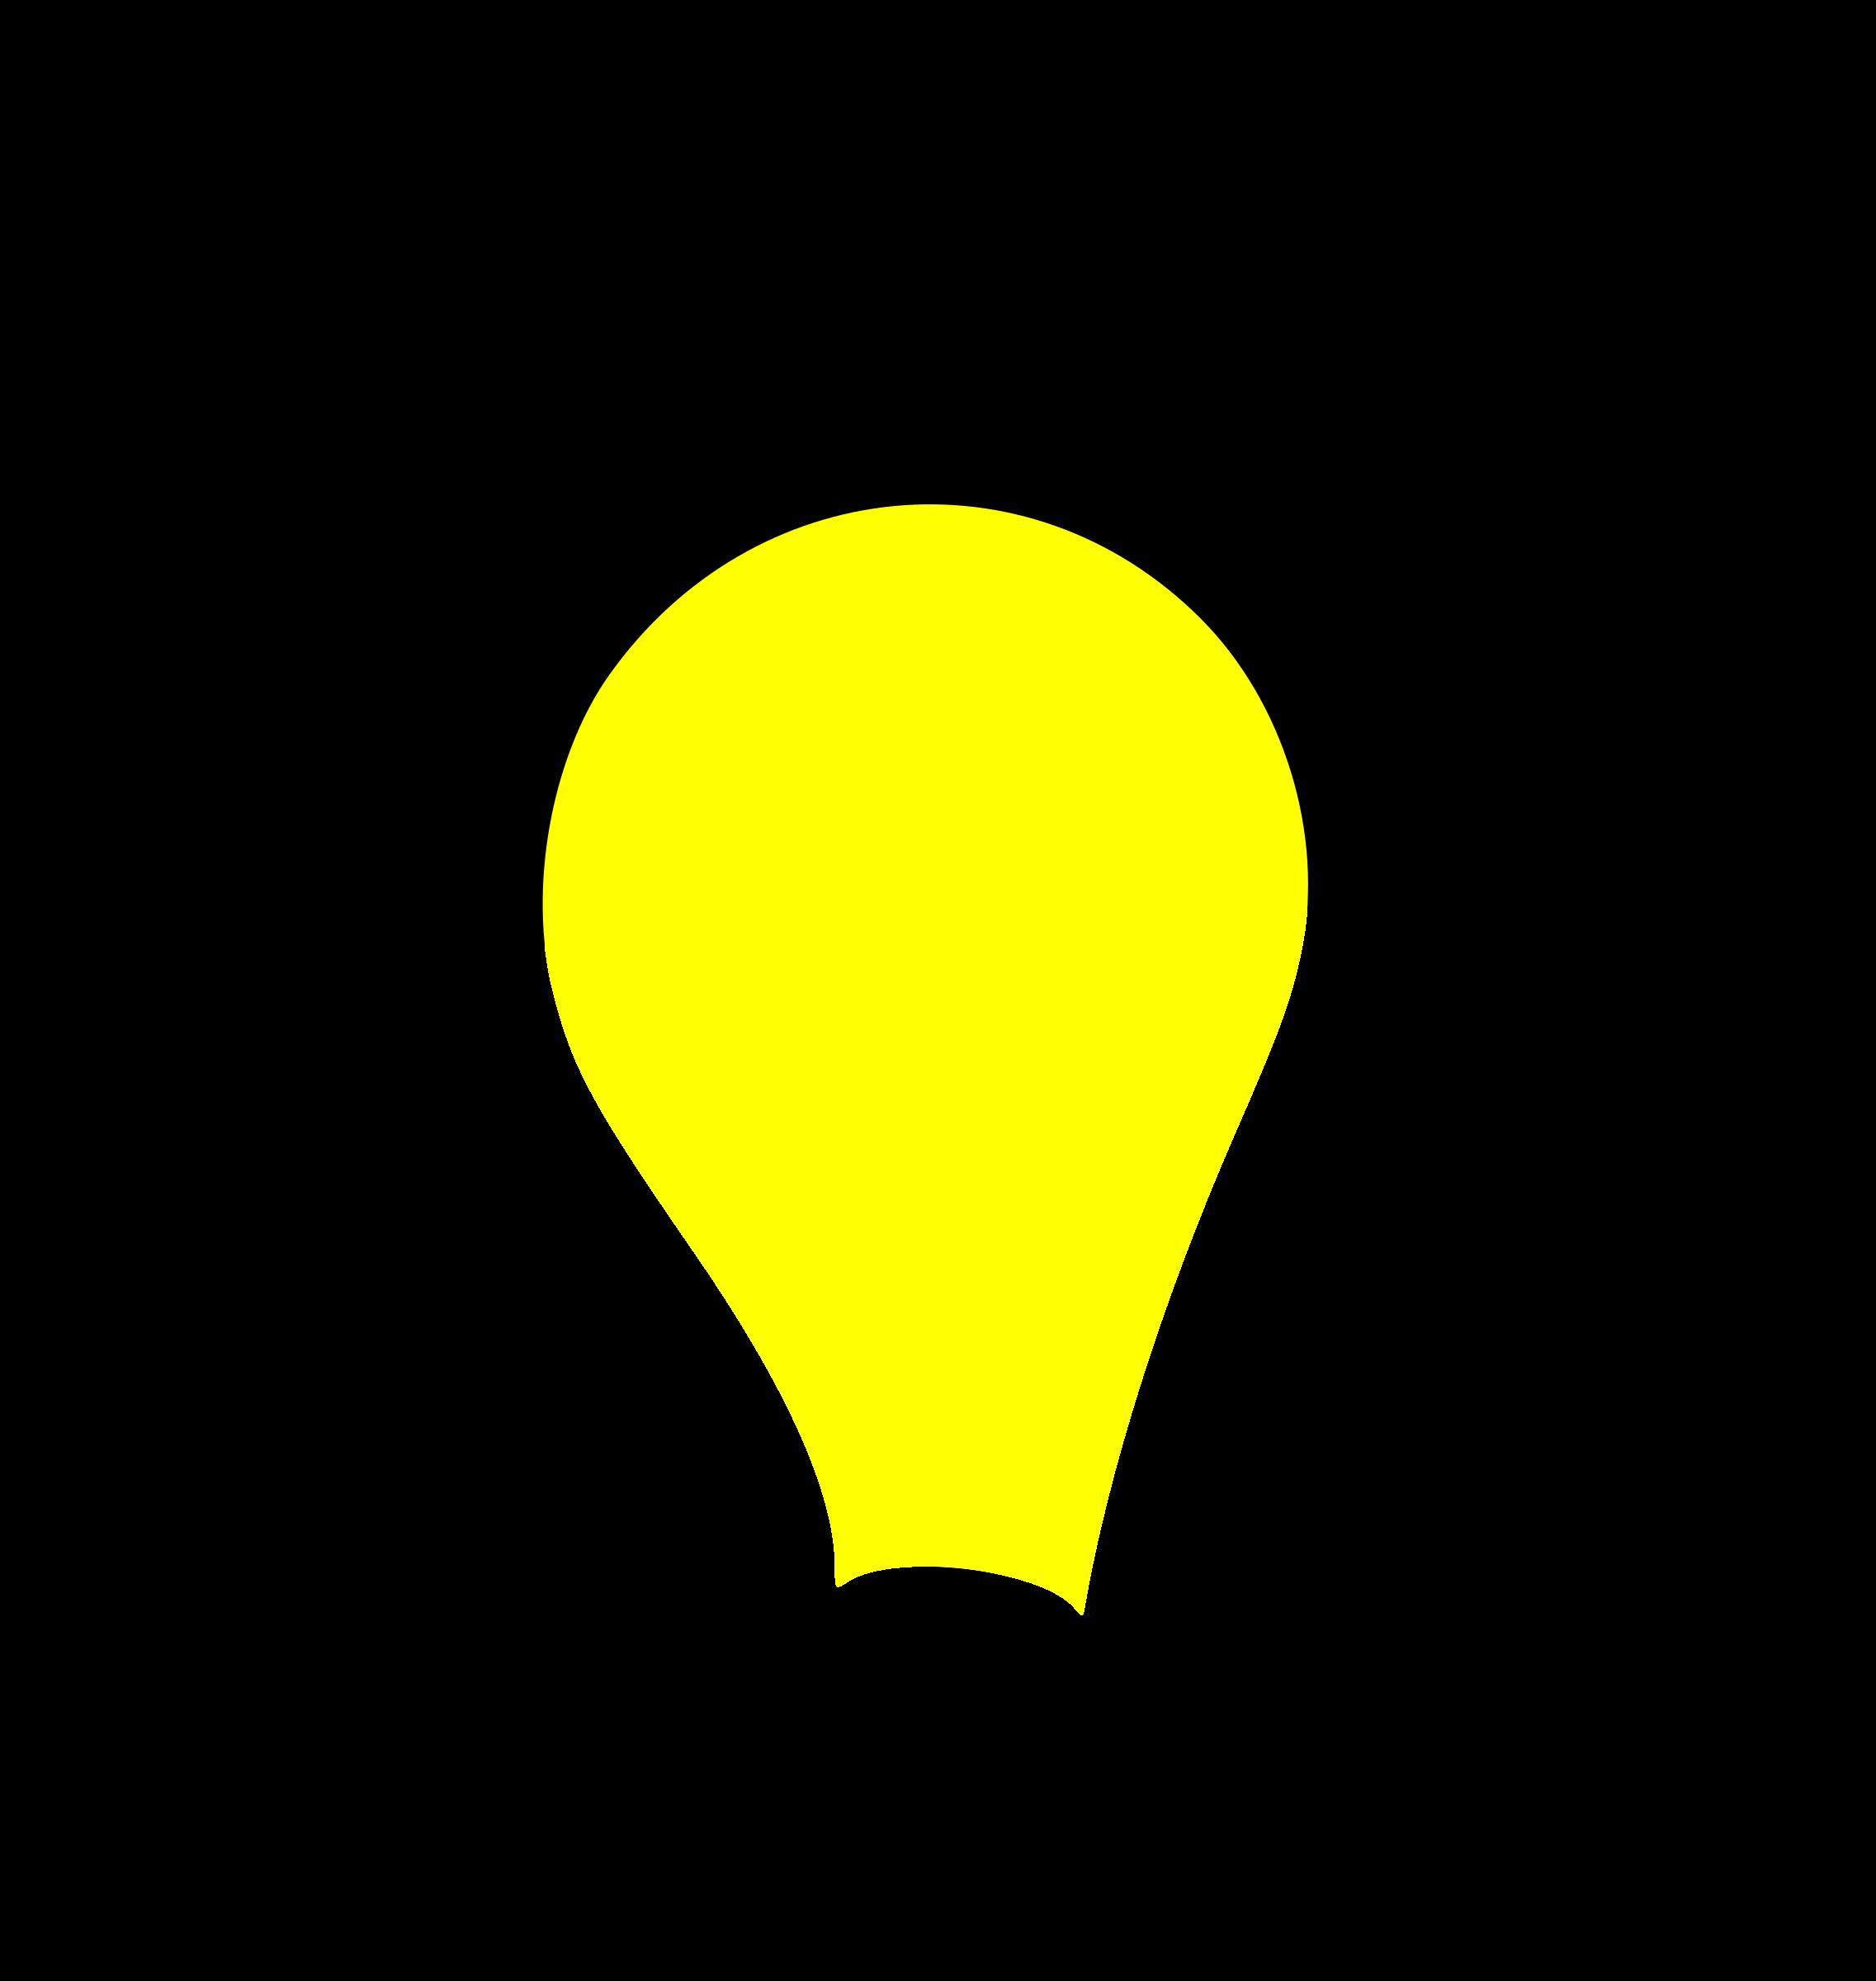 2273x2400 Christmas Light Bulb Clip Art Halloween Amp Holidays Wizard